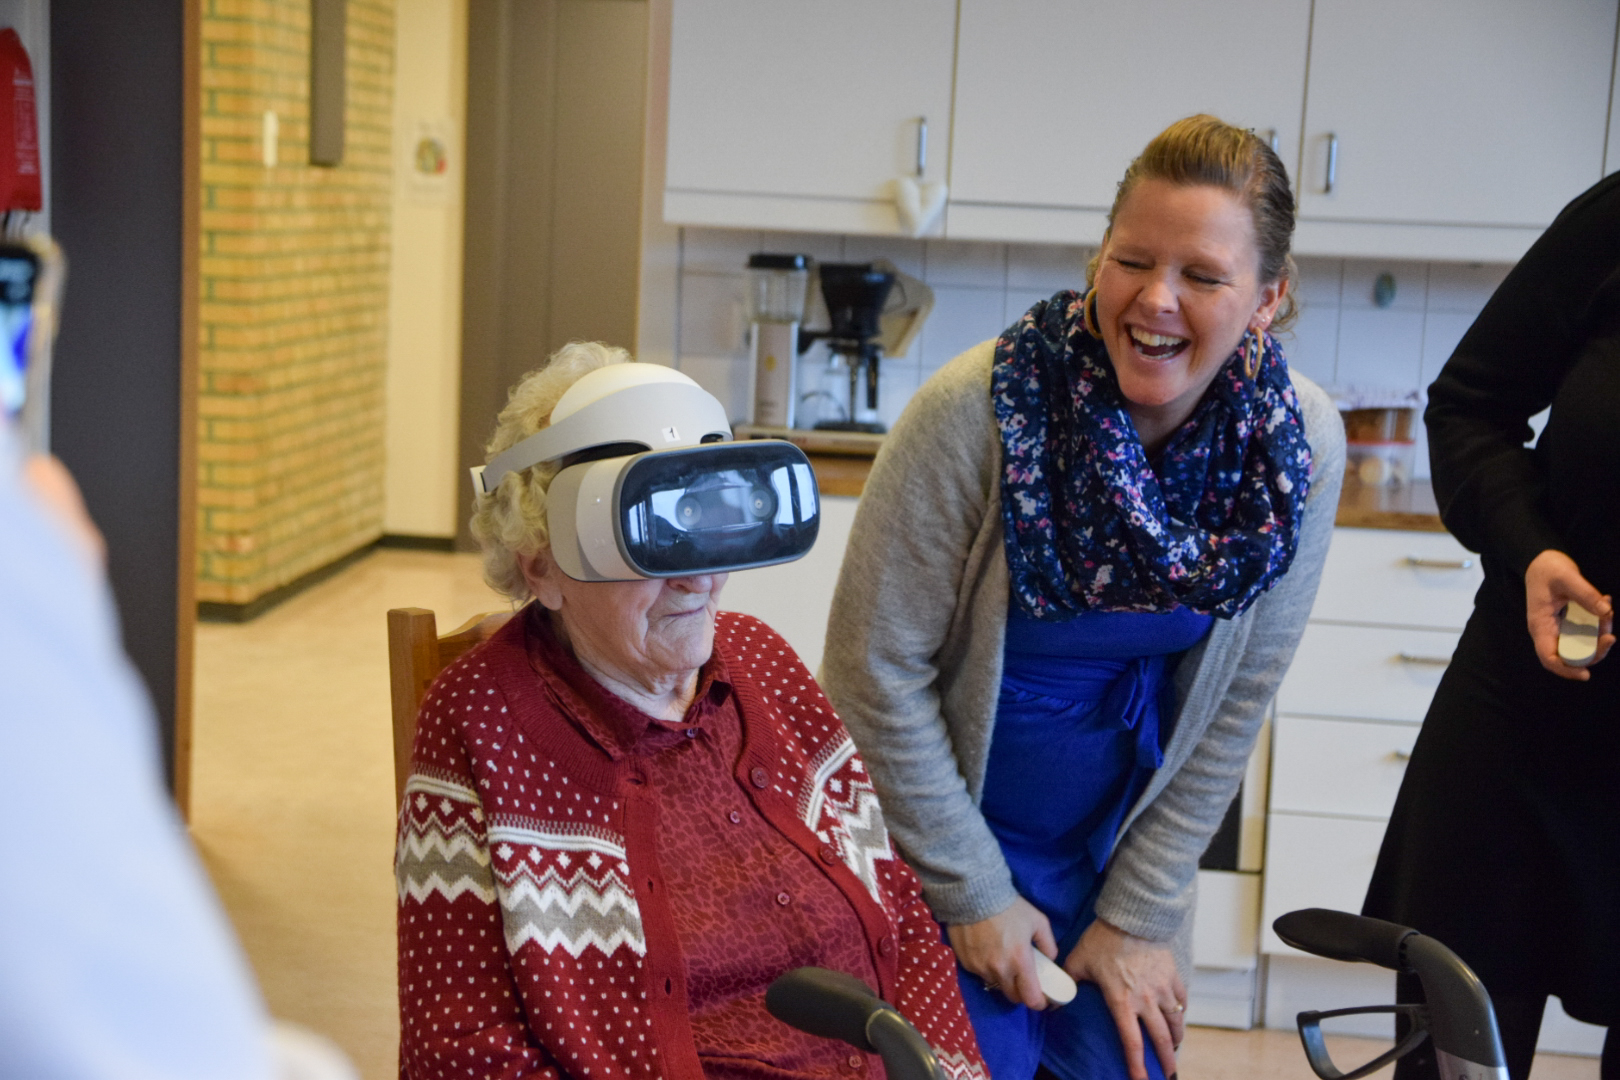 Eldre dame prøver VR-briler. Yngre dame står ved siden av og smiler.